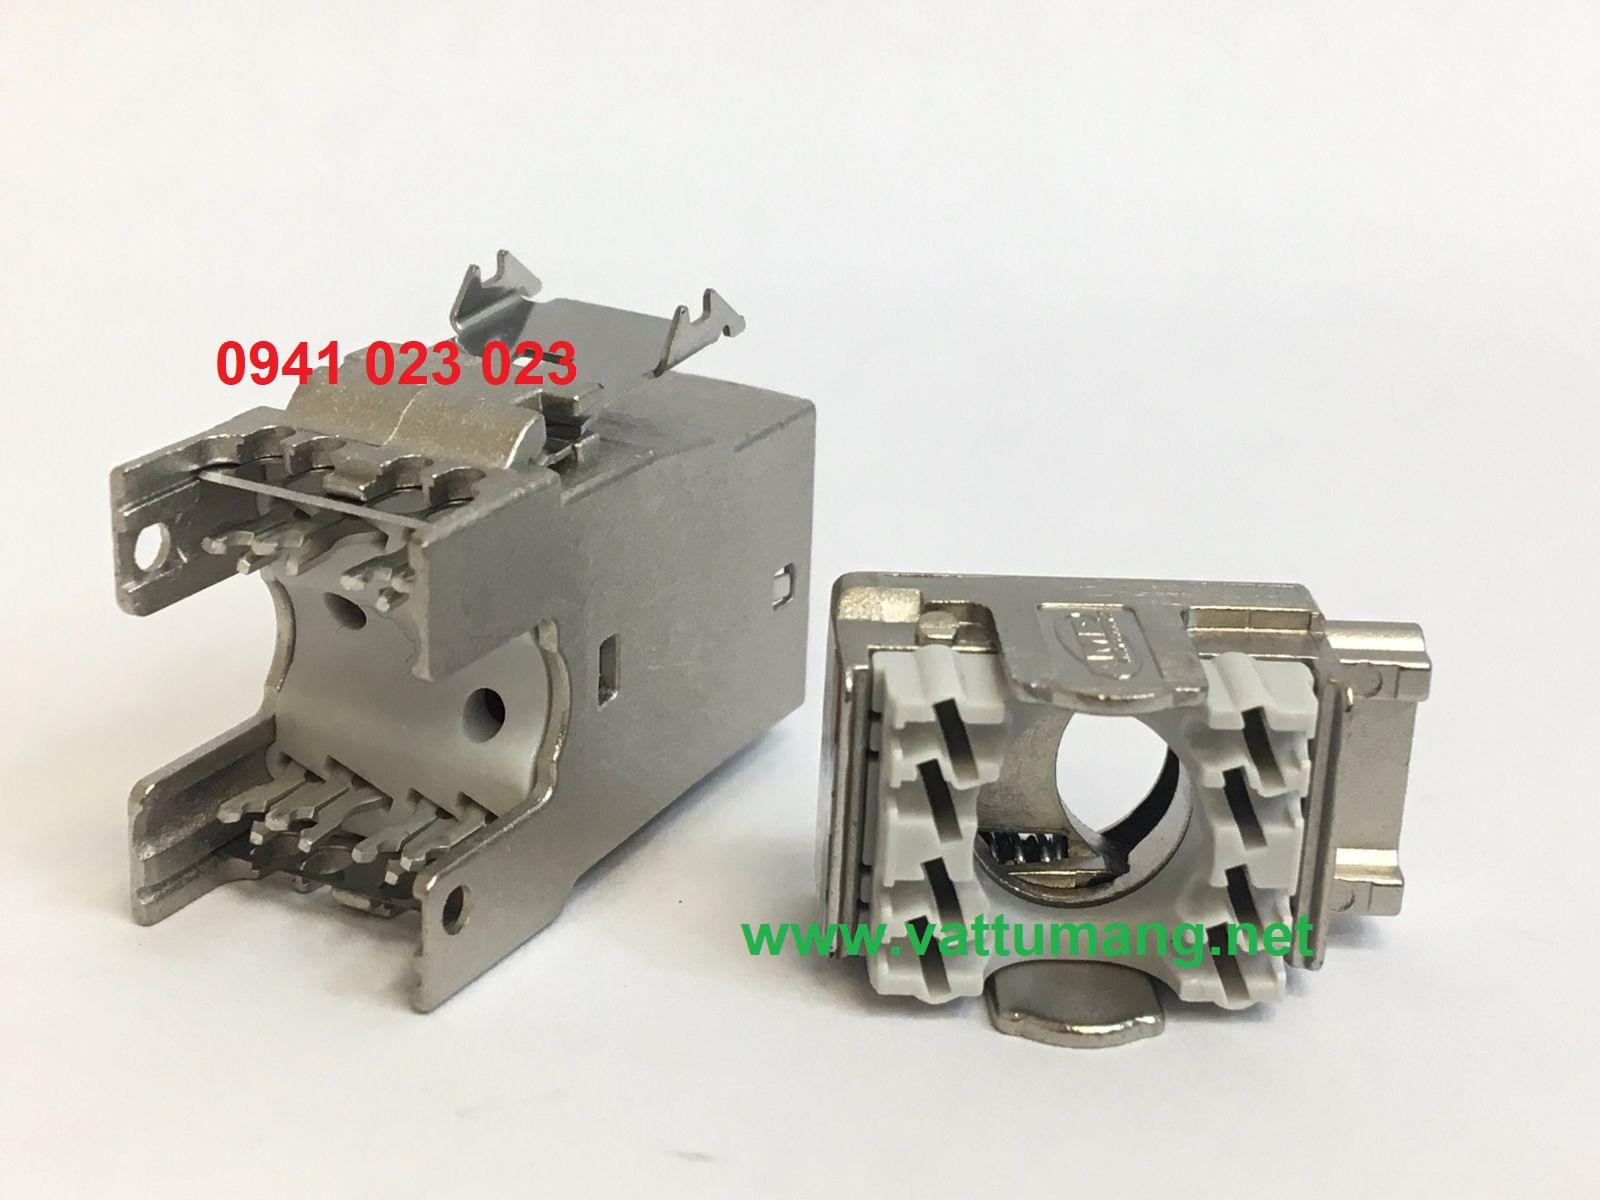 Modular jack Cat6A AMP/Commscope (2153449-4)